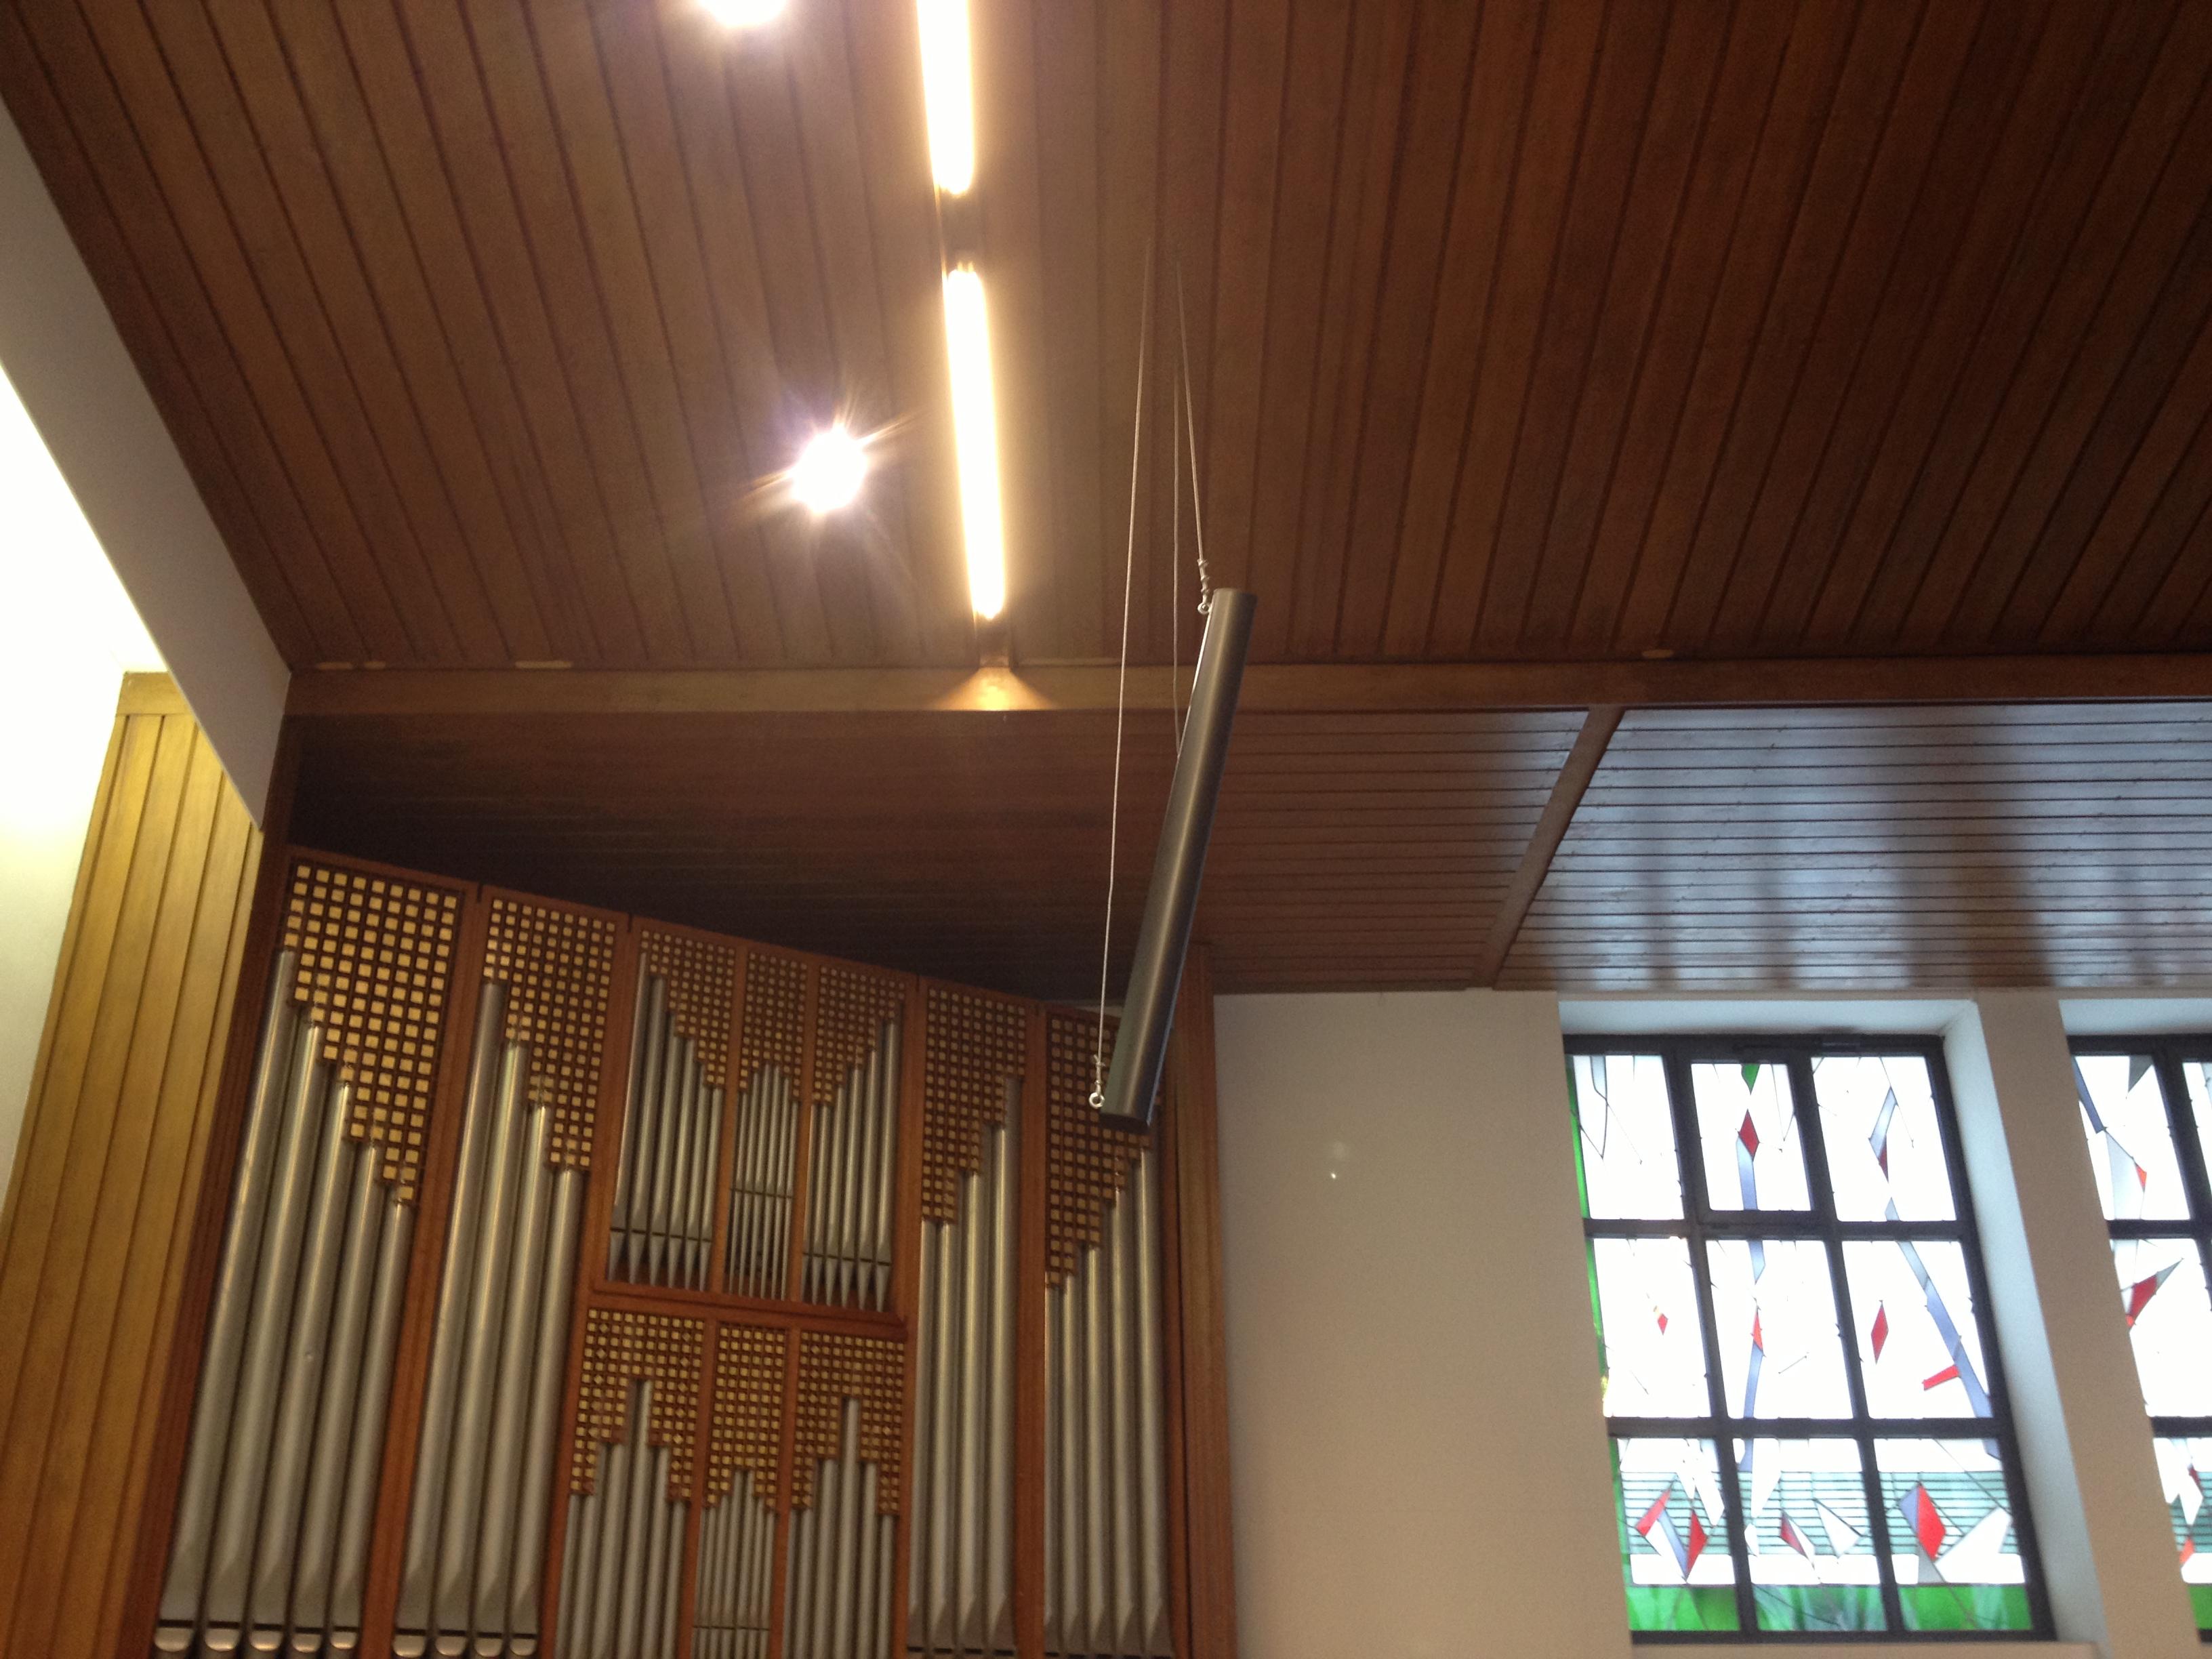 Kolibri-Medias-Kirche-Lautsprecher-Decke